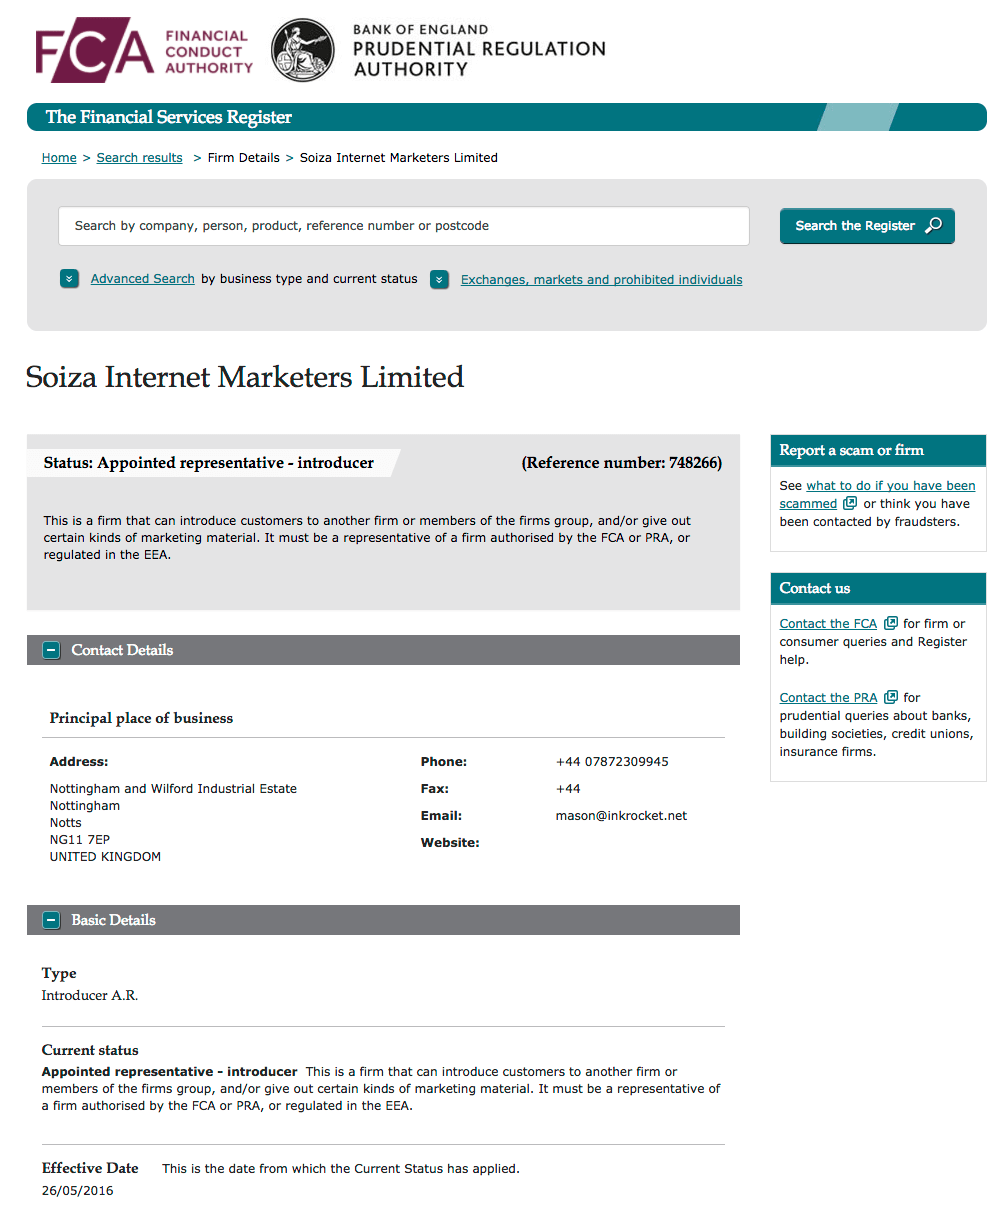 https://www.wordfence.com/blog/2017/09/man-behind-plugin-spam-mason-soiza/?fref=gc&dti=776347859078780